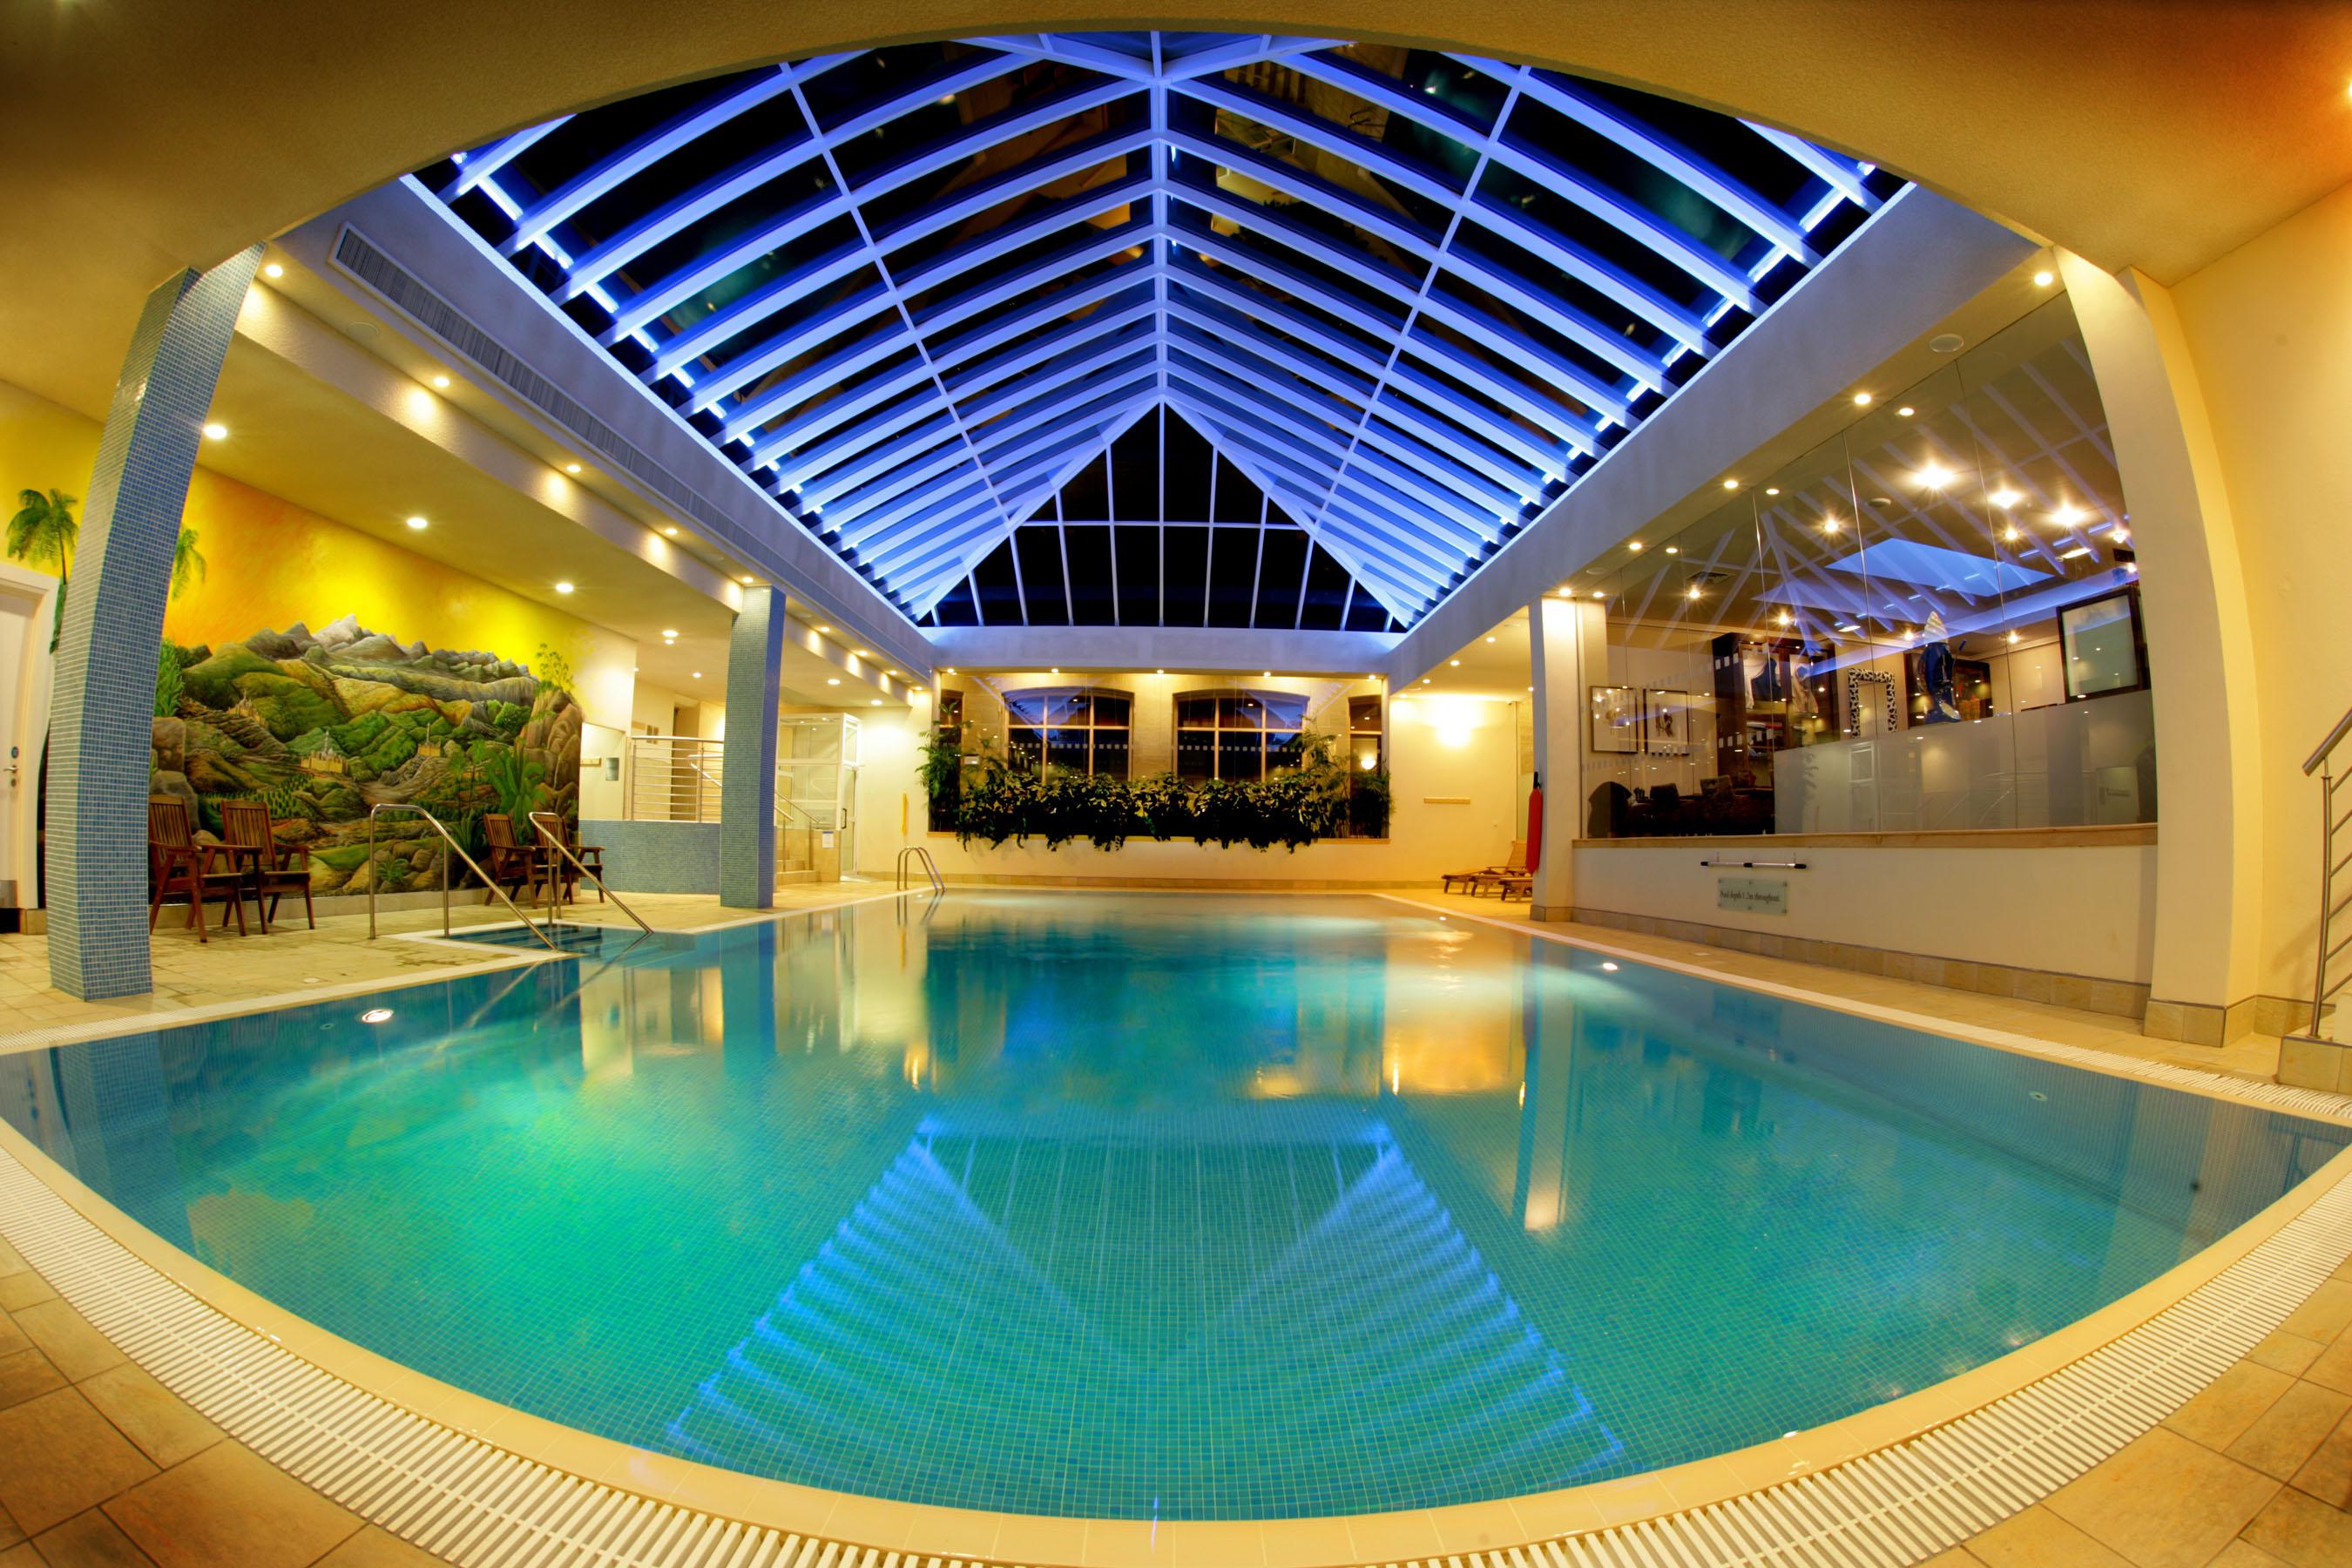 Indoor swimming pool ideas homesfeed - Best home swimming pools ...